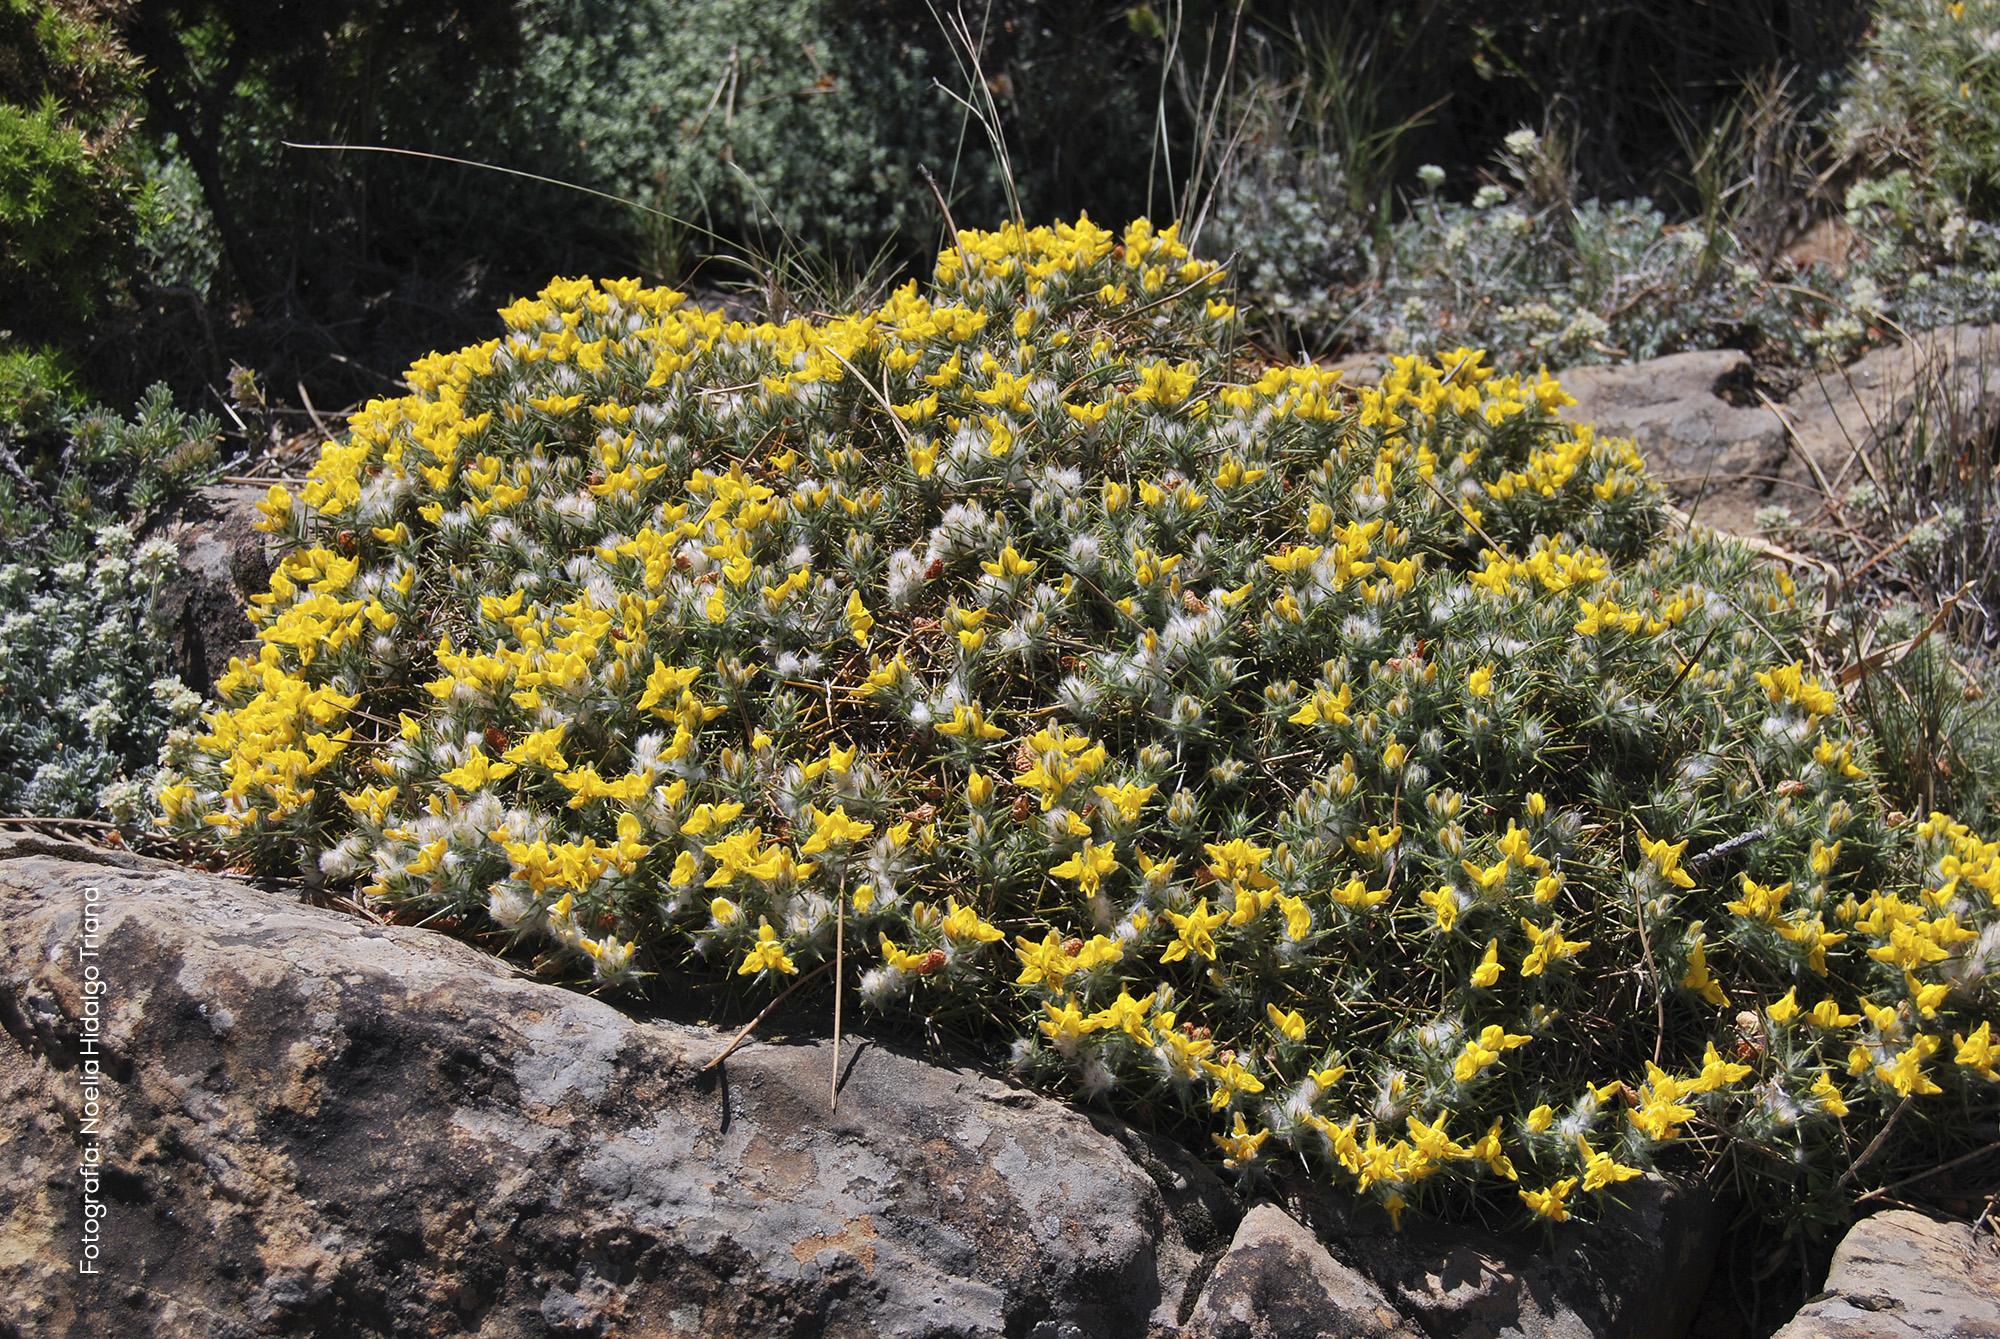 Genista hirsuta subsp. lanuginosa